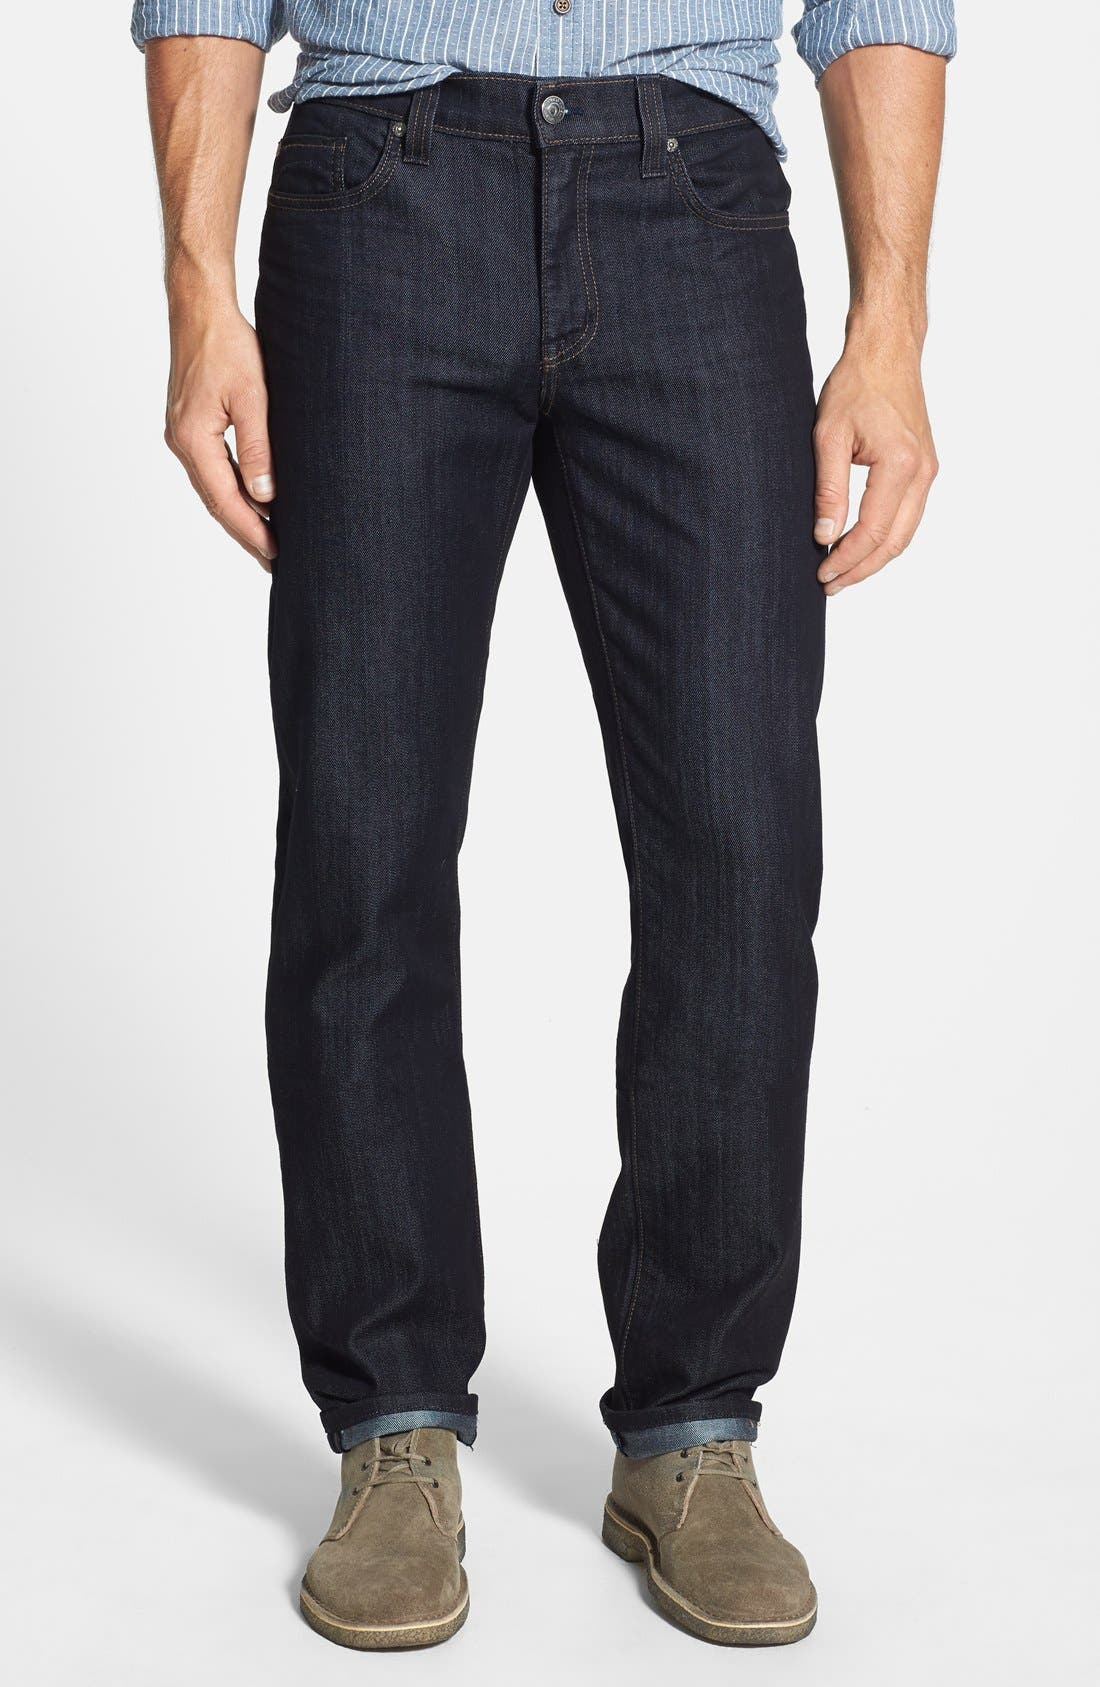 Fidelity Denim 50-11 Relaxed Fit Jeans (Revolution Rinse)